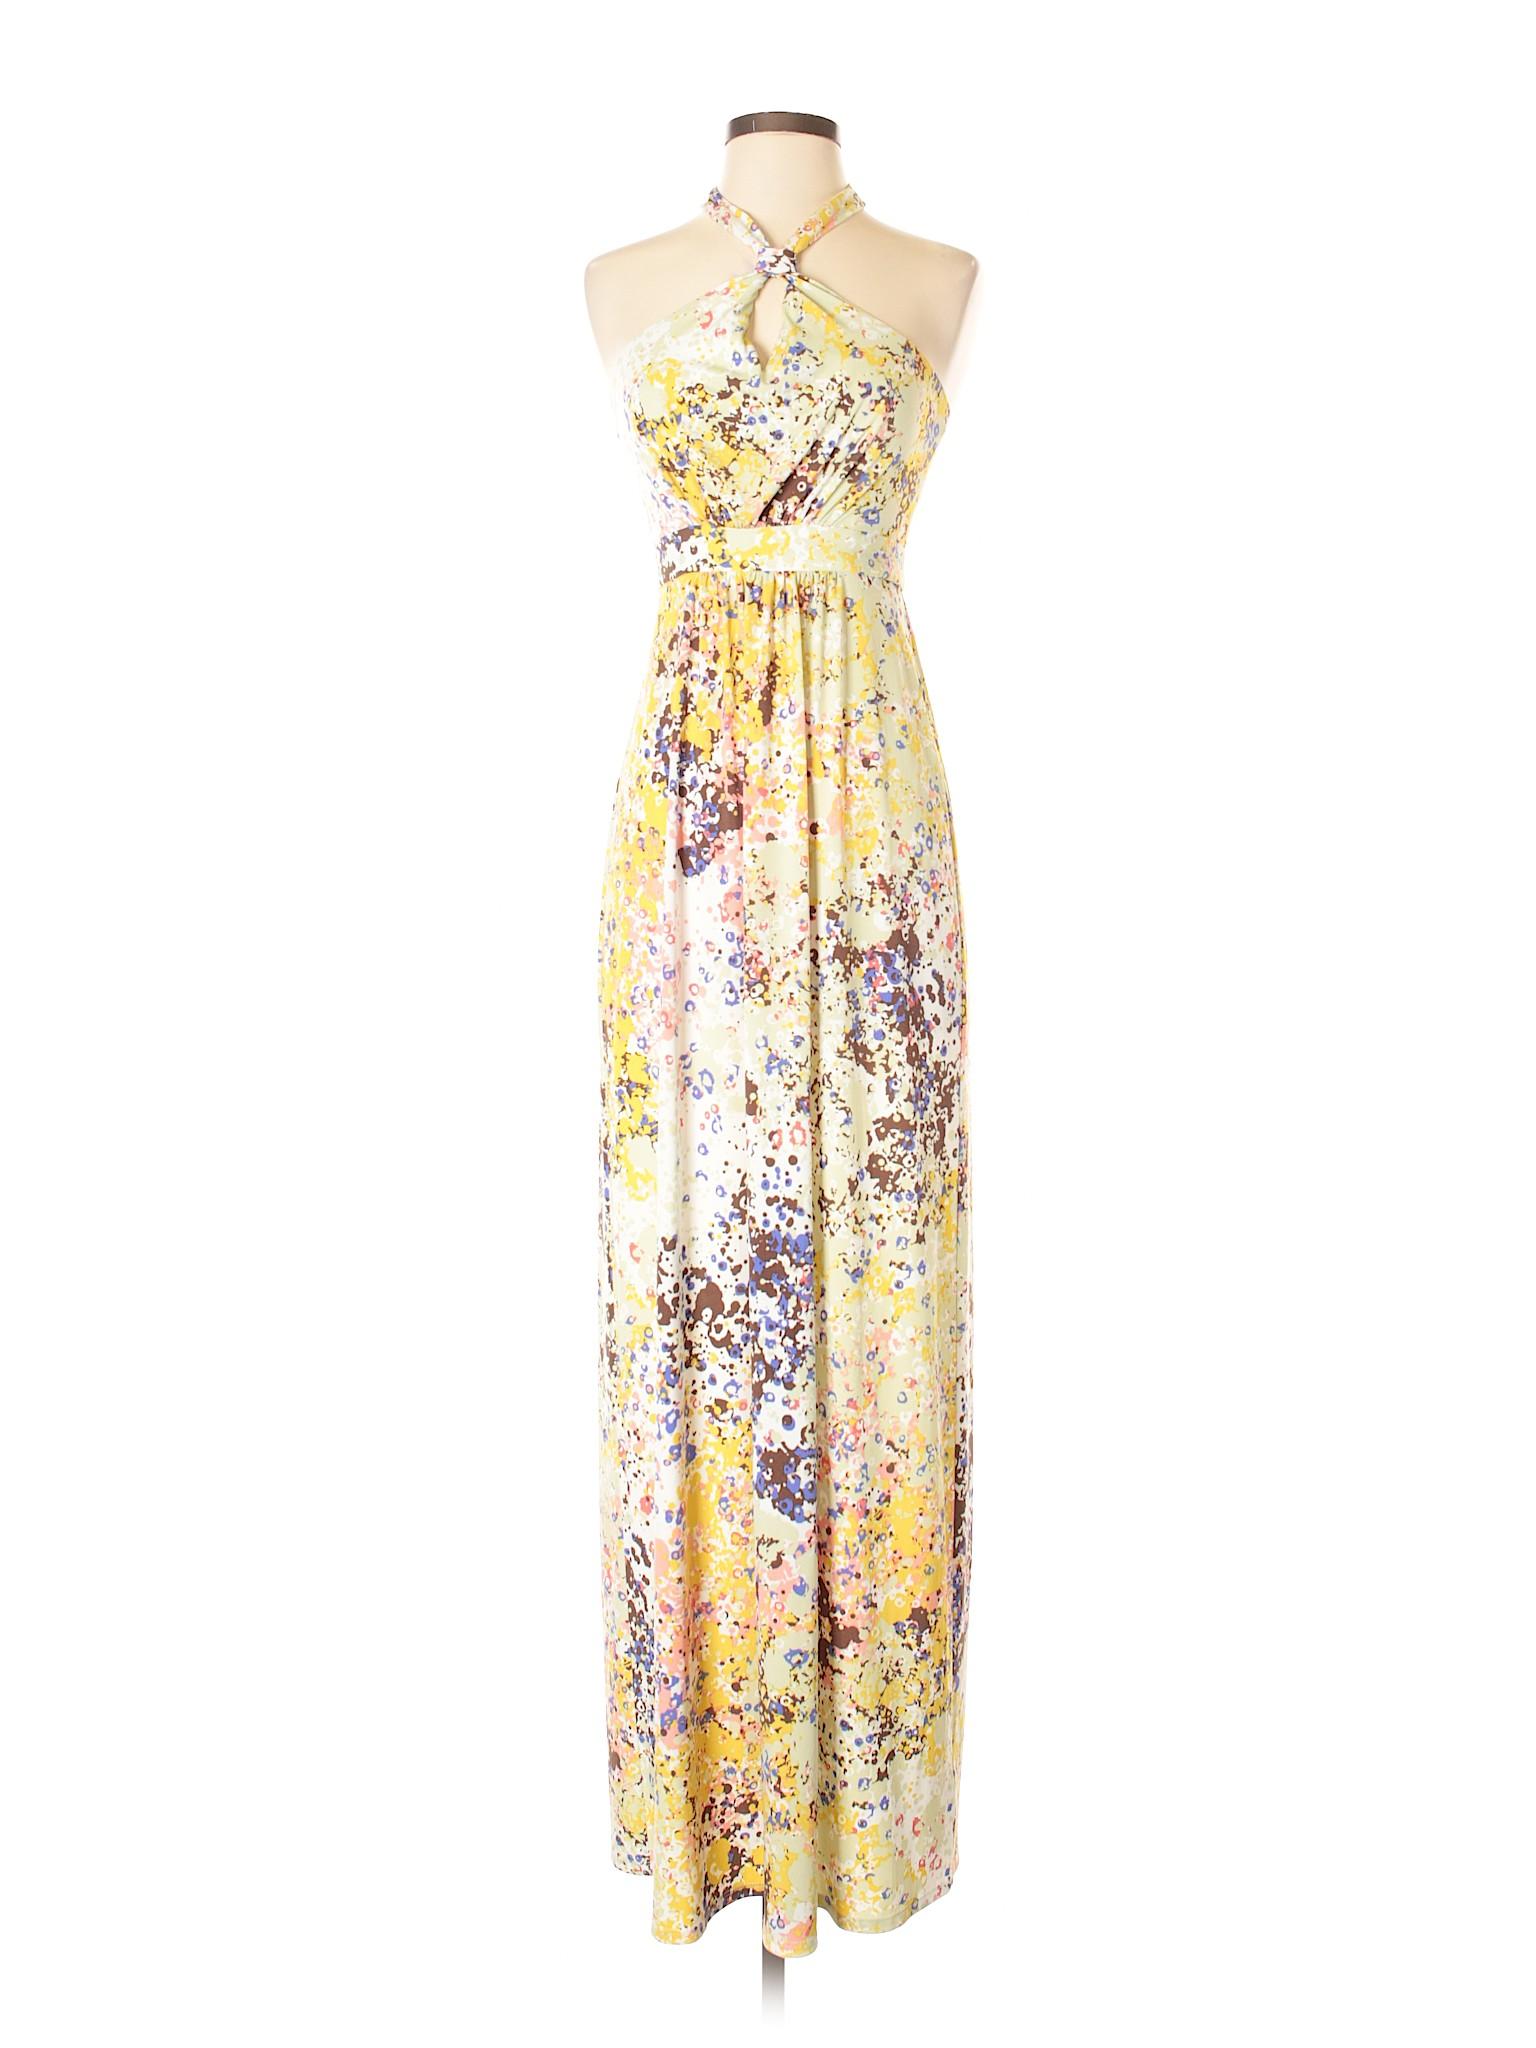 Boutique Boutique Dress Winter Winter Guess Casual qTOq1w